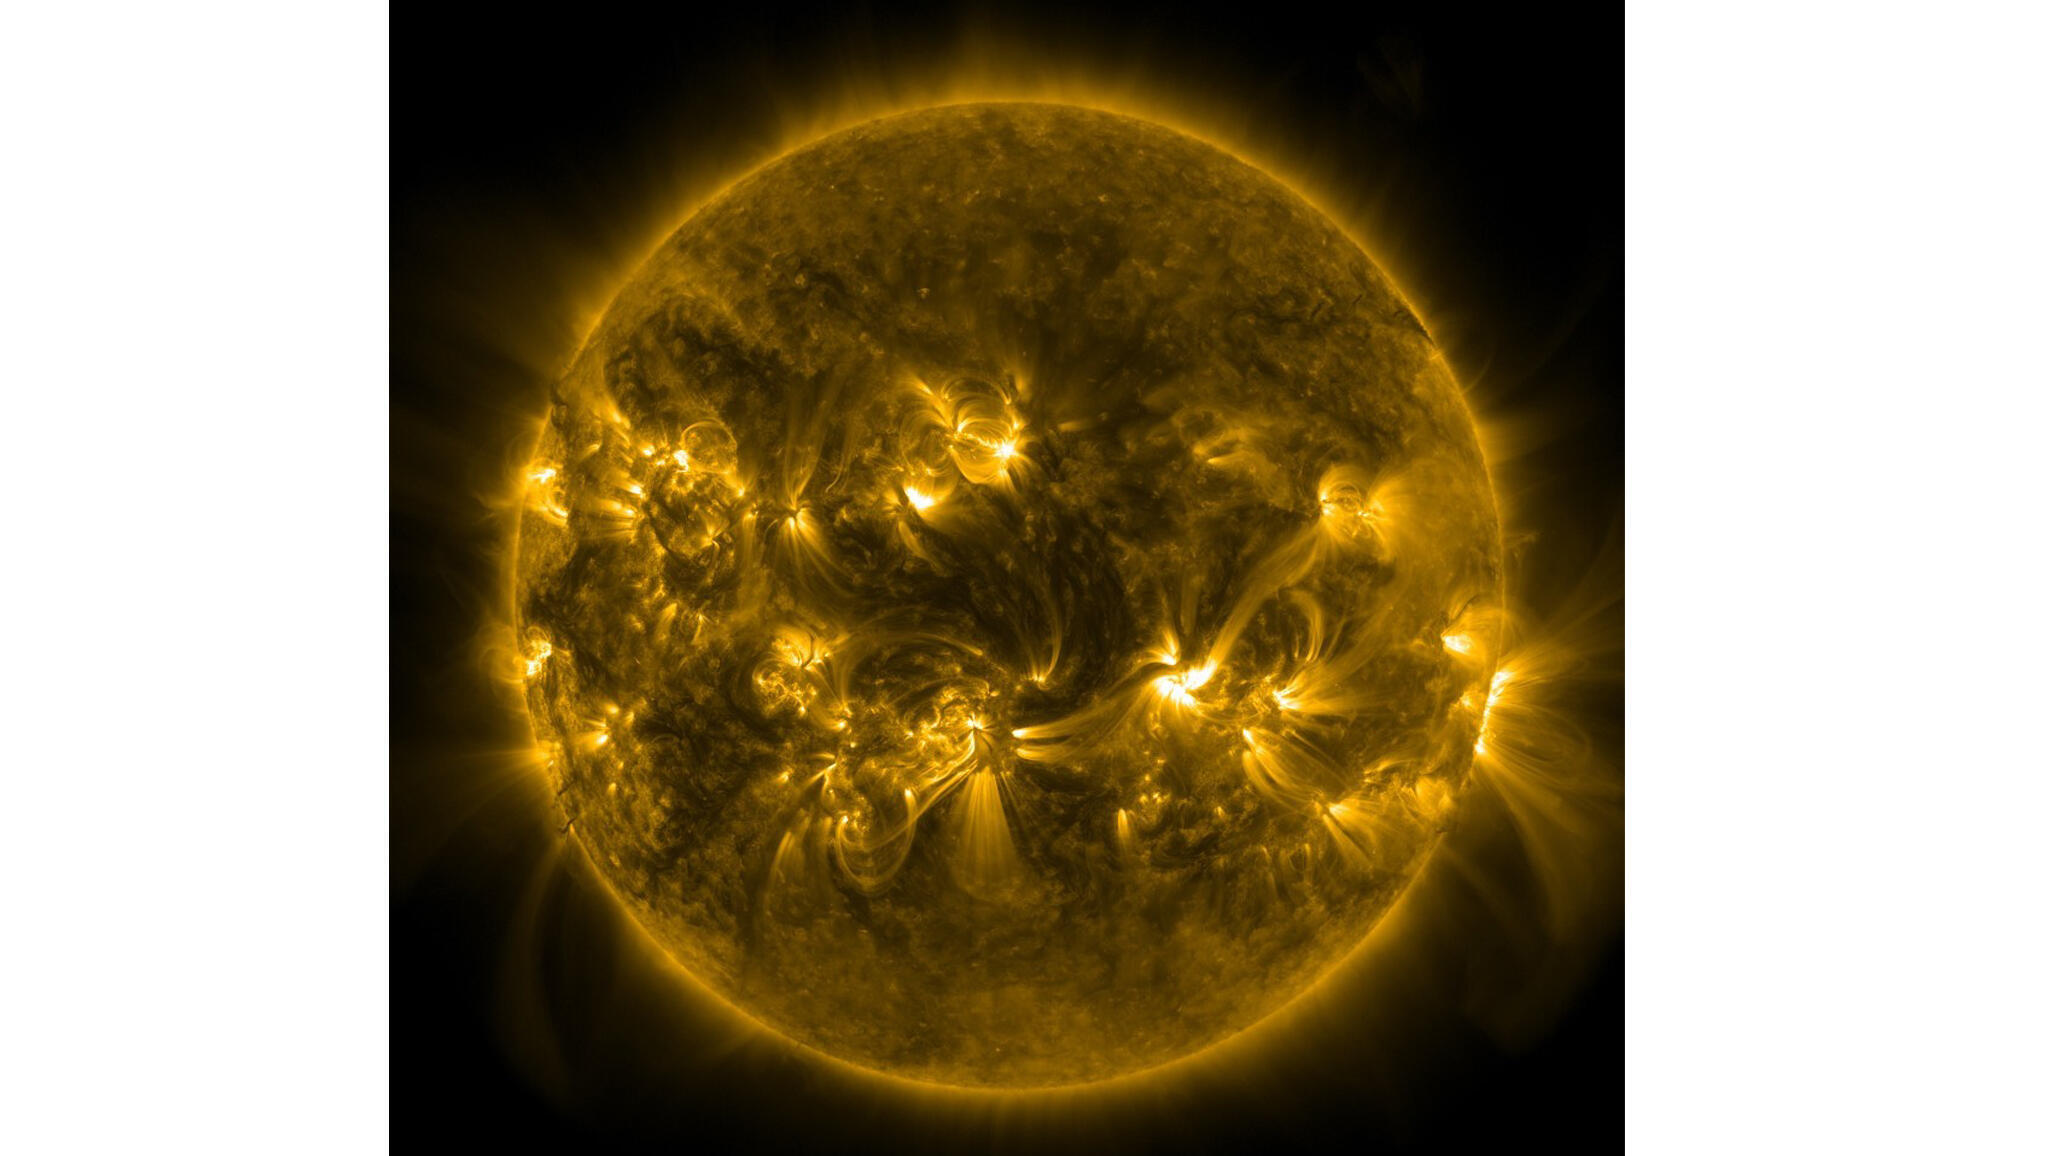 Image du Soleil venant du satellite SDO.